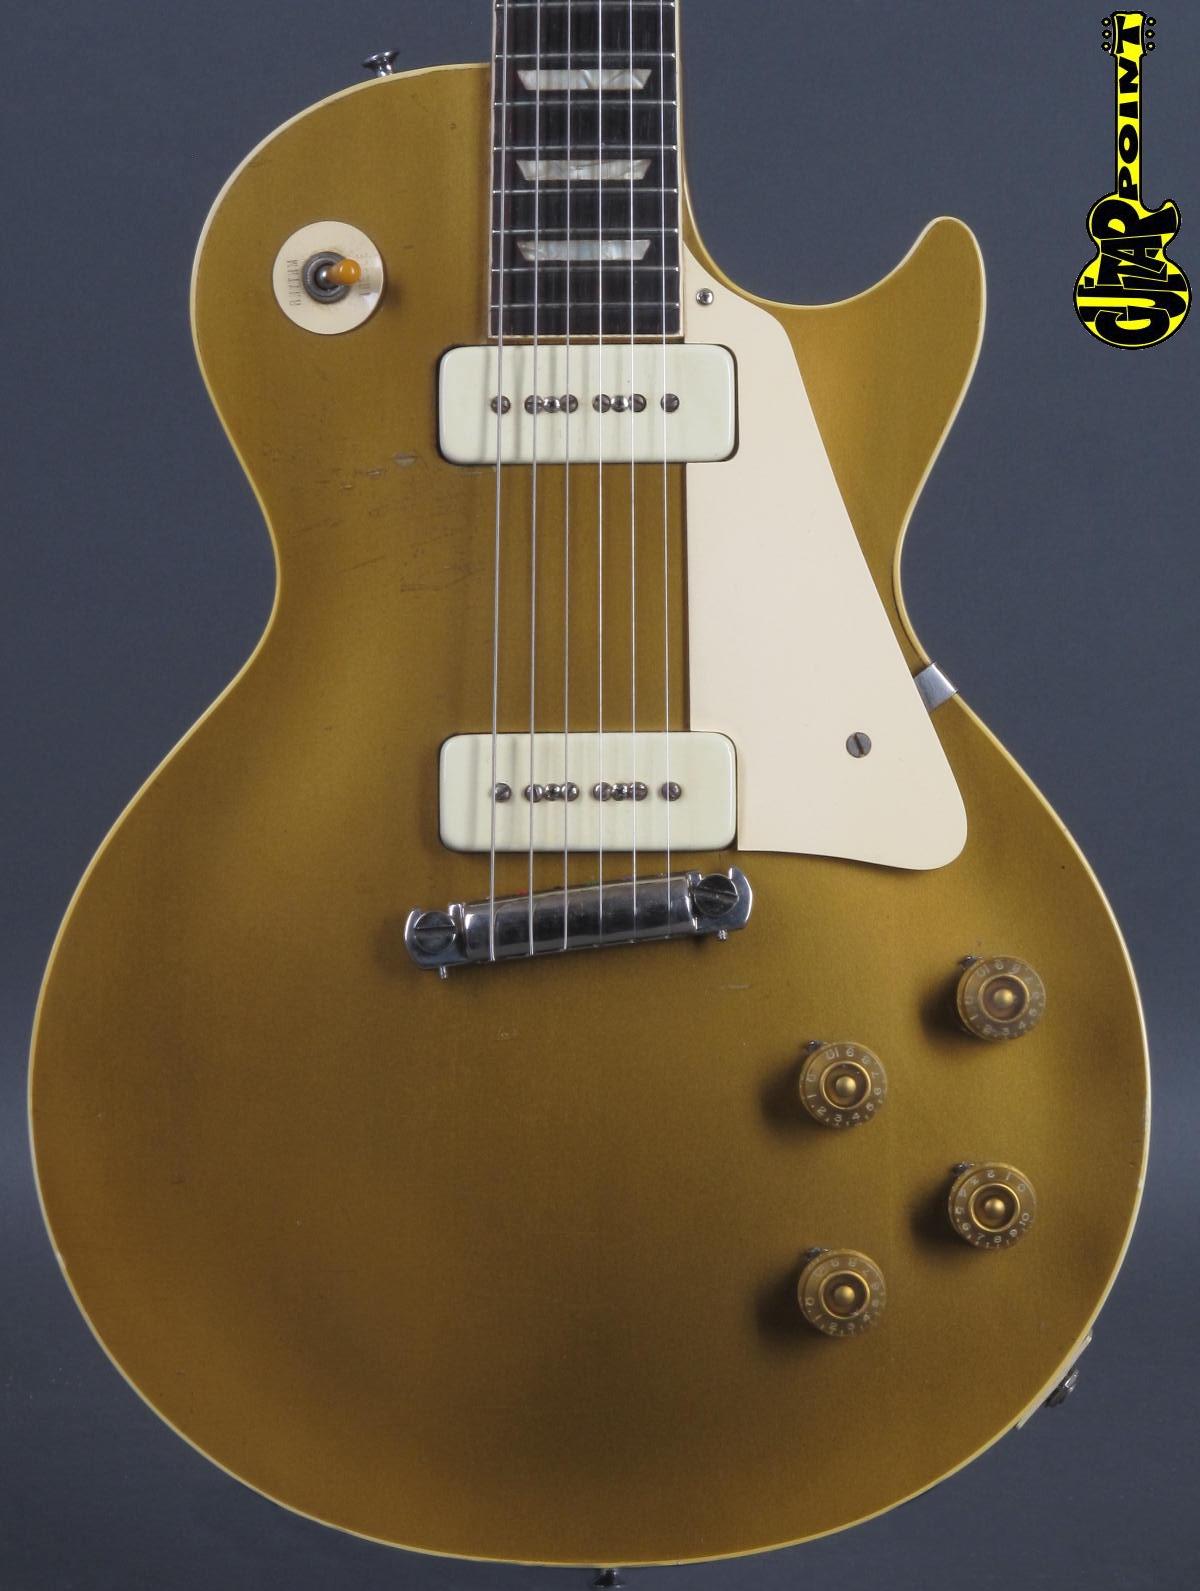 1953 Gibson Les Paul Standard - Goldtop